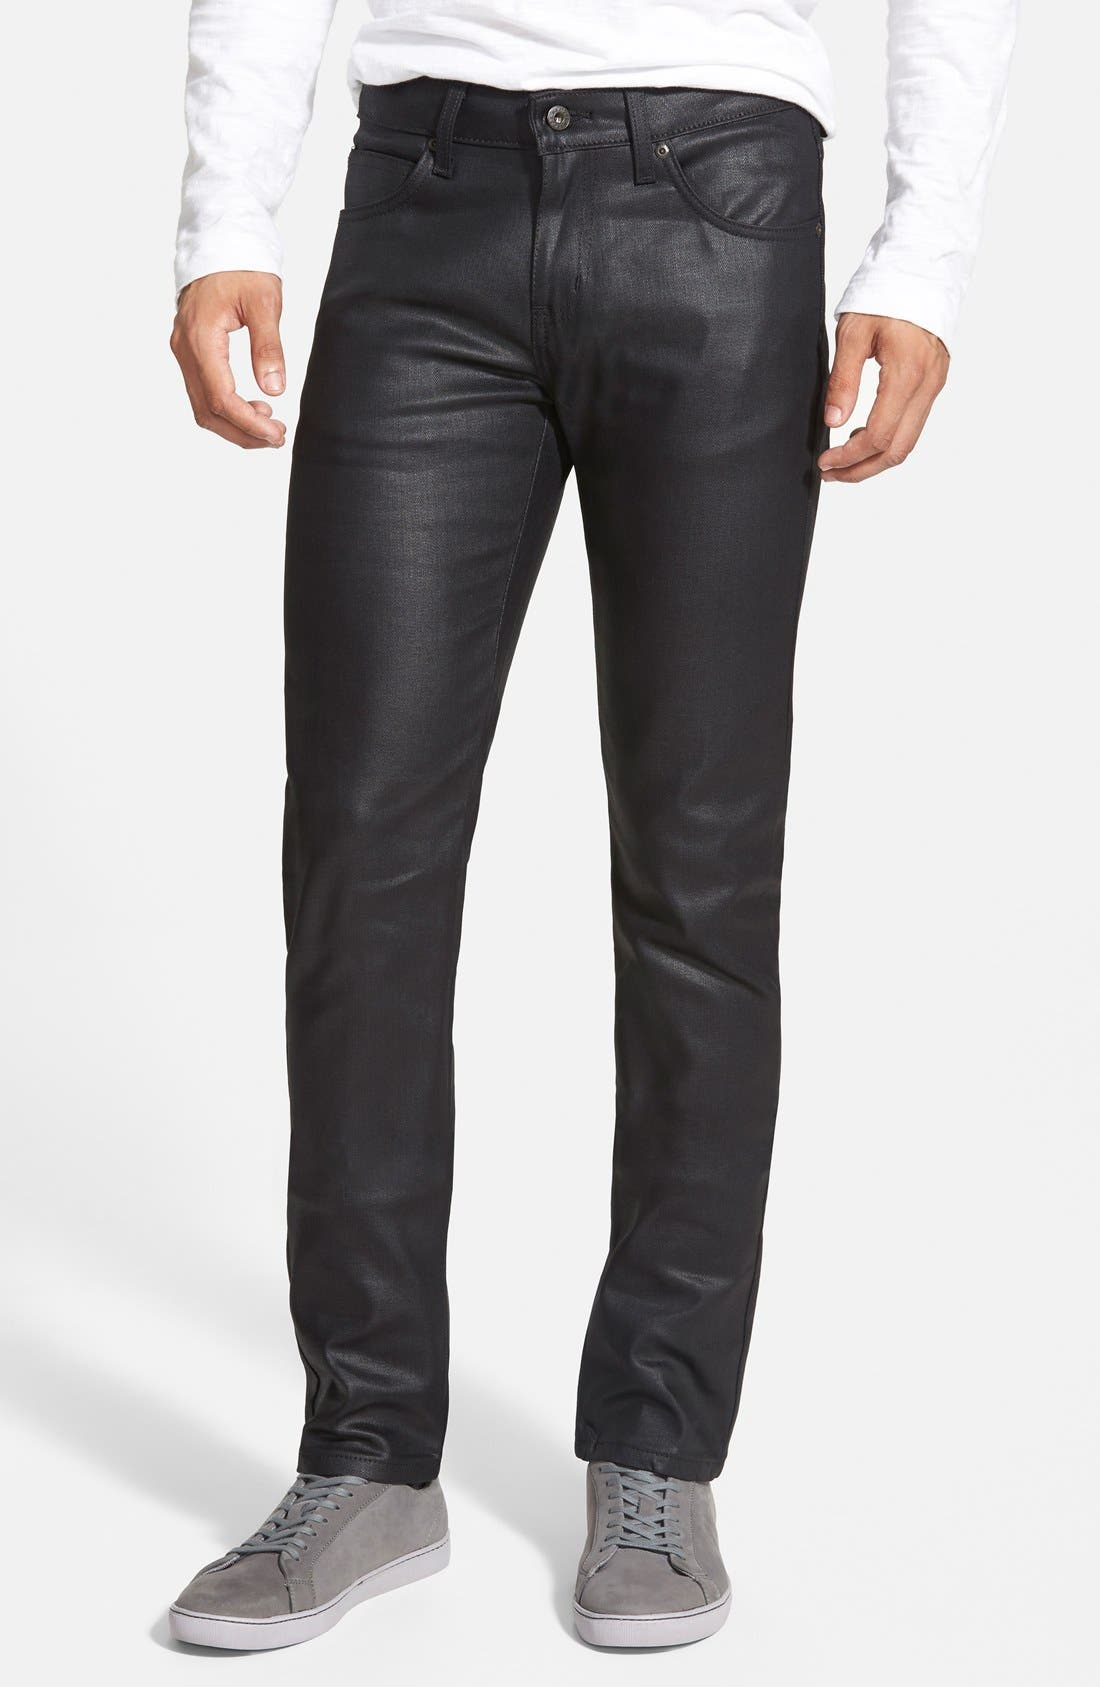 Naked & Famous Denim Super Skinny Guy Skinny Jeans (Black)